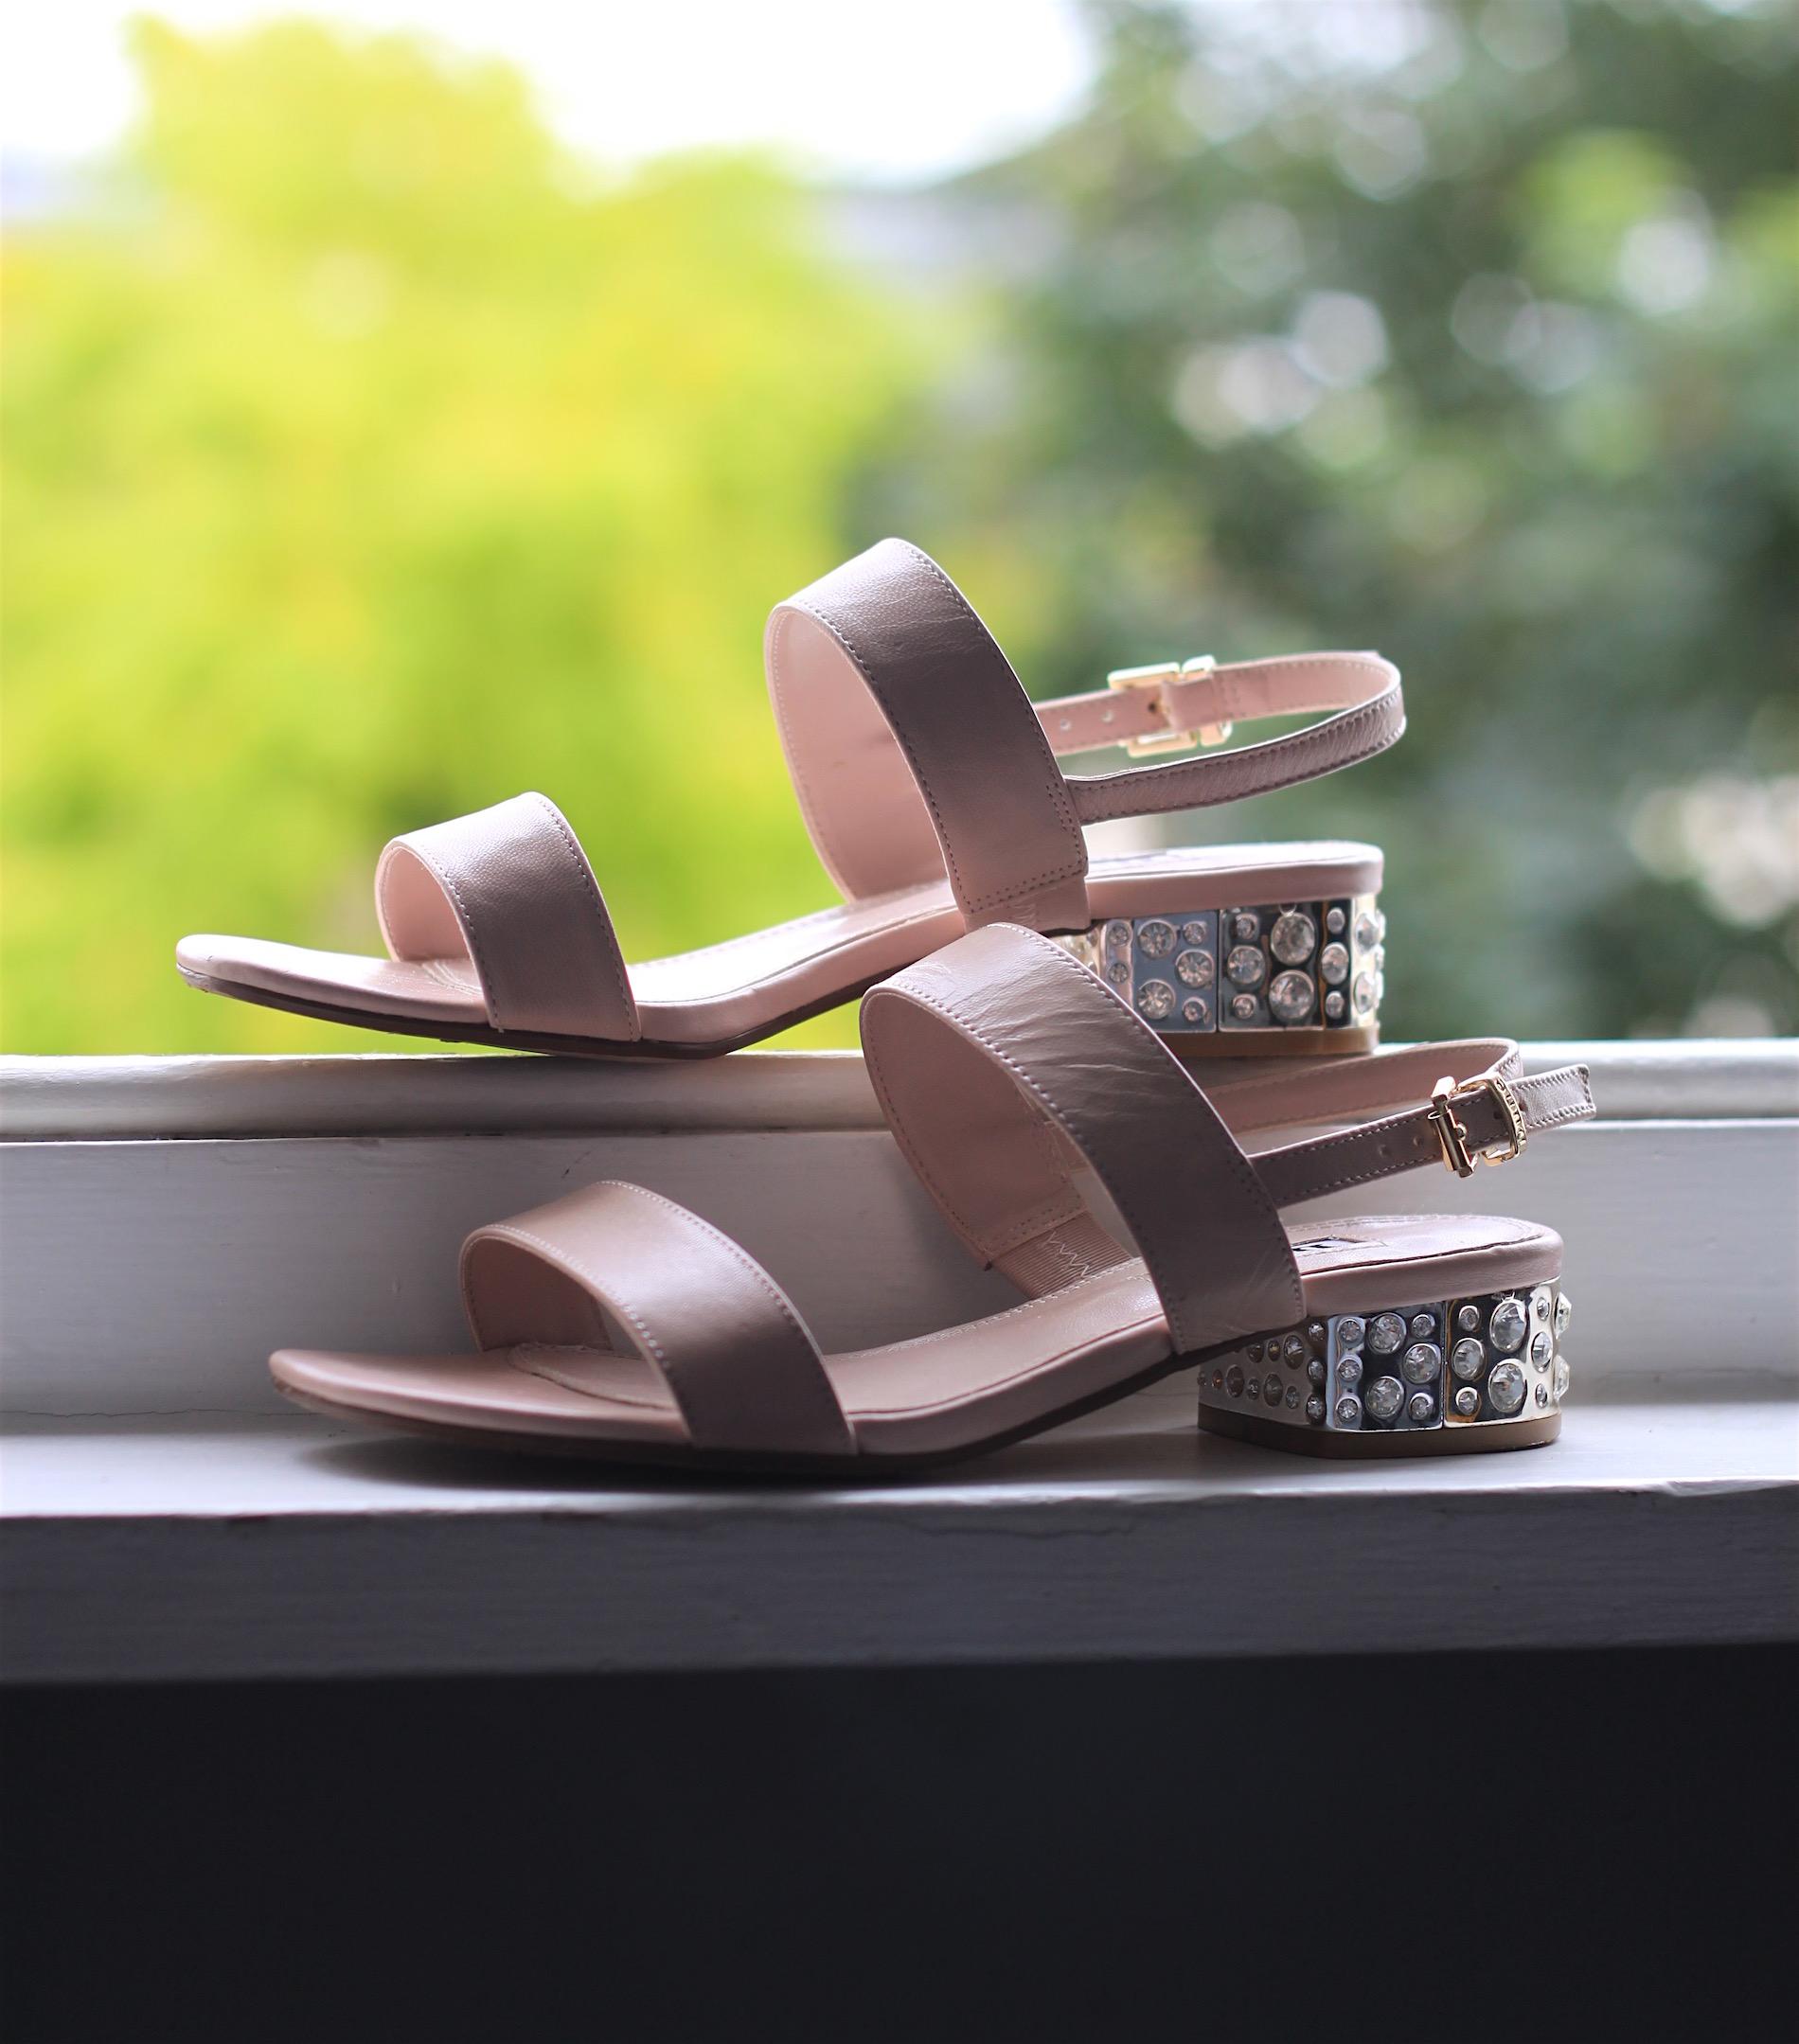 summer-dune-sandals-miu-miu-pink-crystal-heel